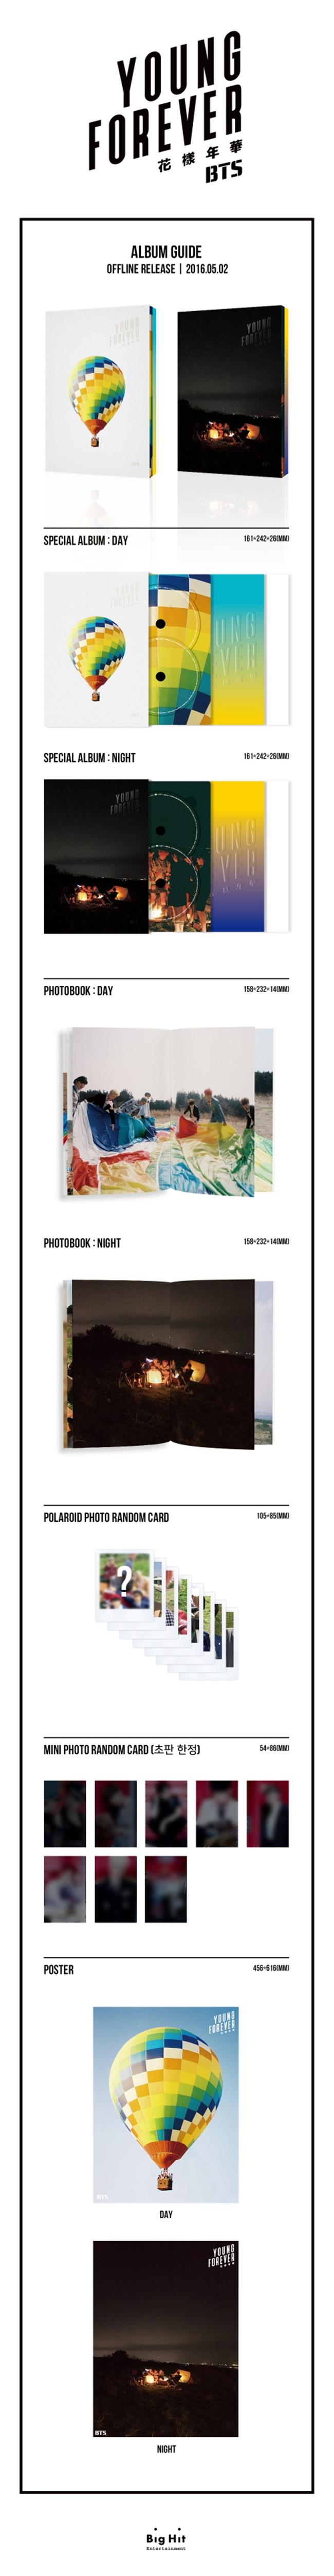 Music-Plaza.com : KPOP, CD, DVD, Korean Music CD, Korean Drama Soundtracks